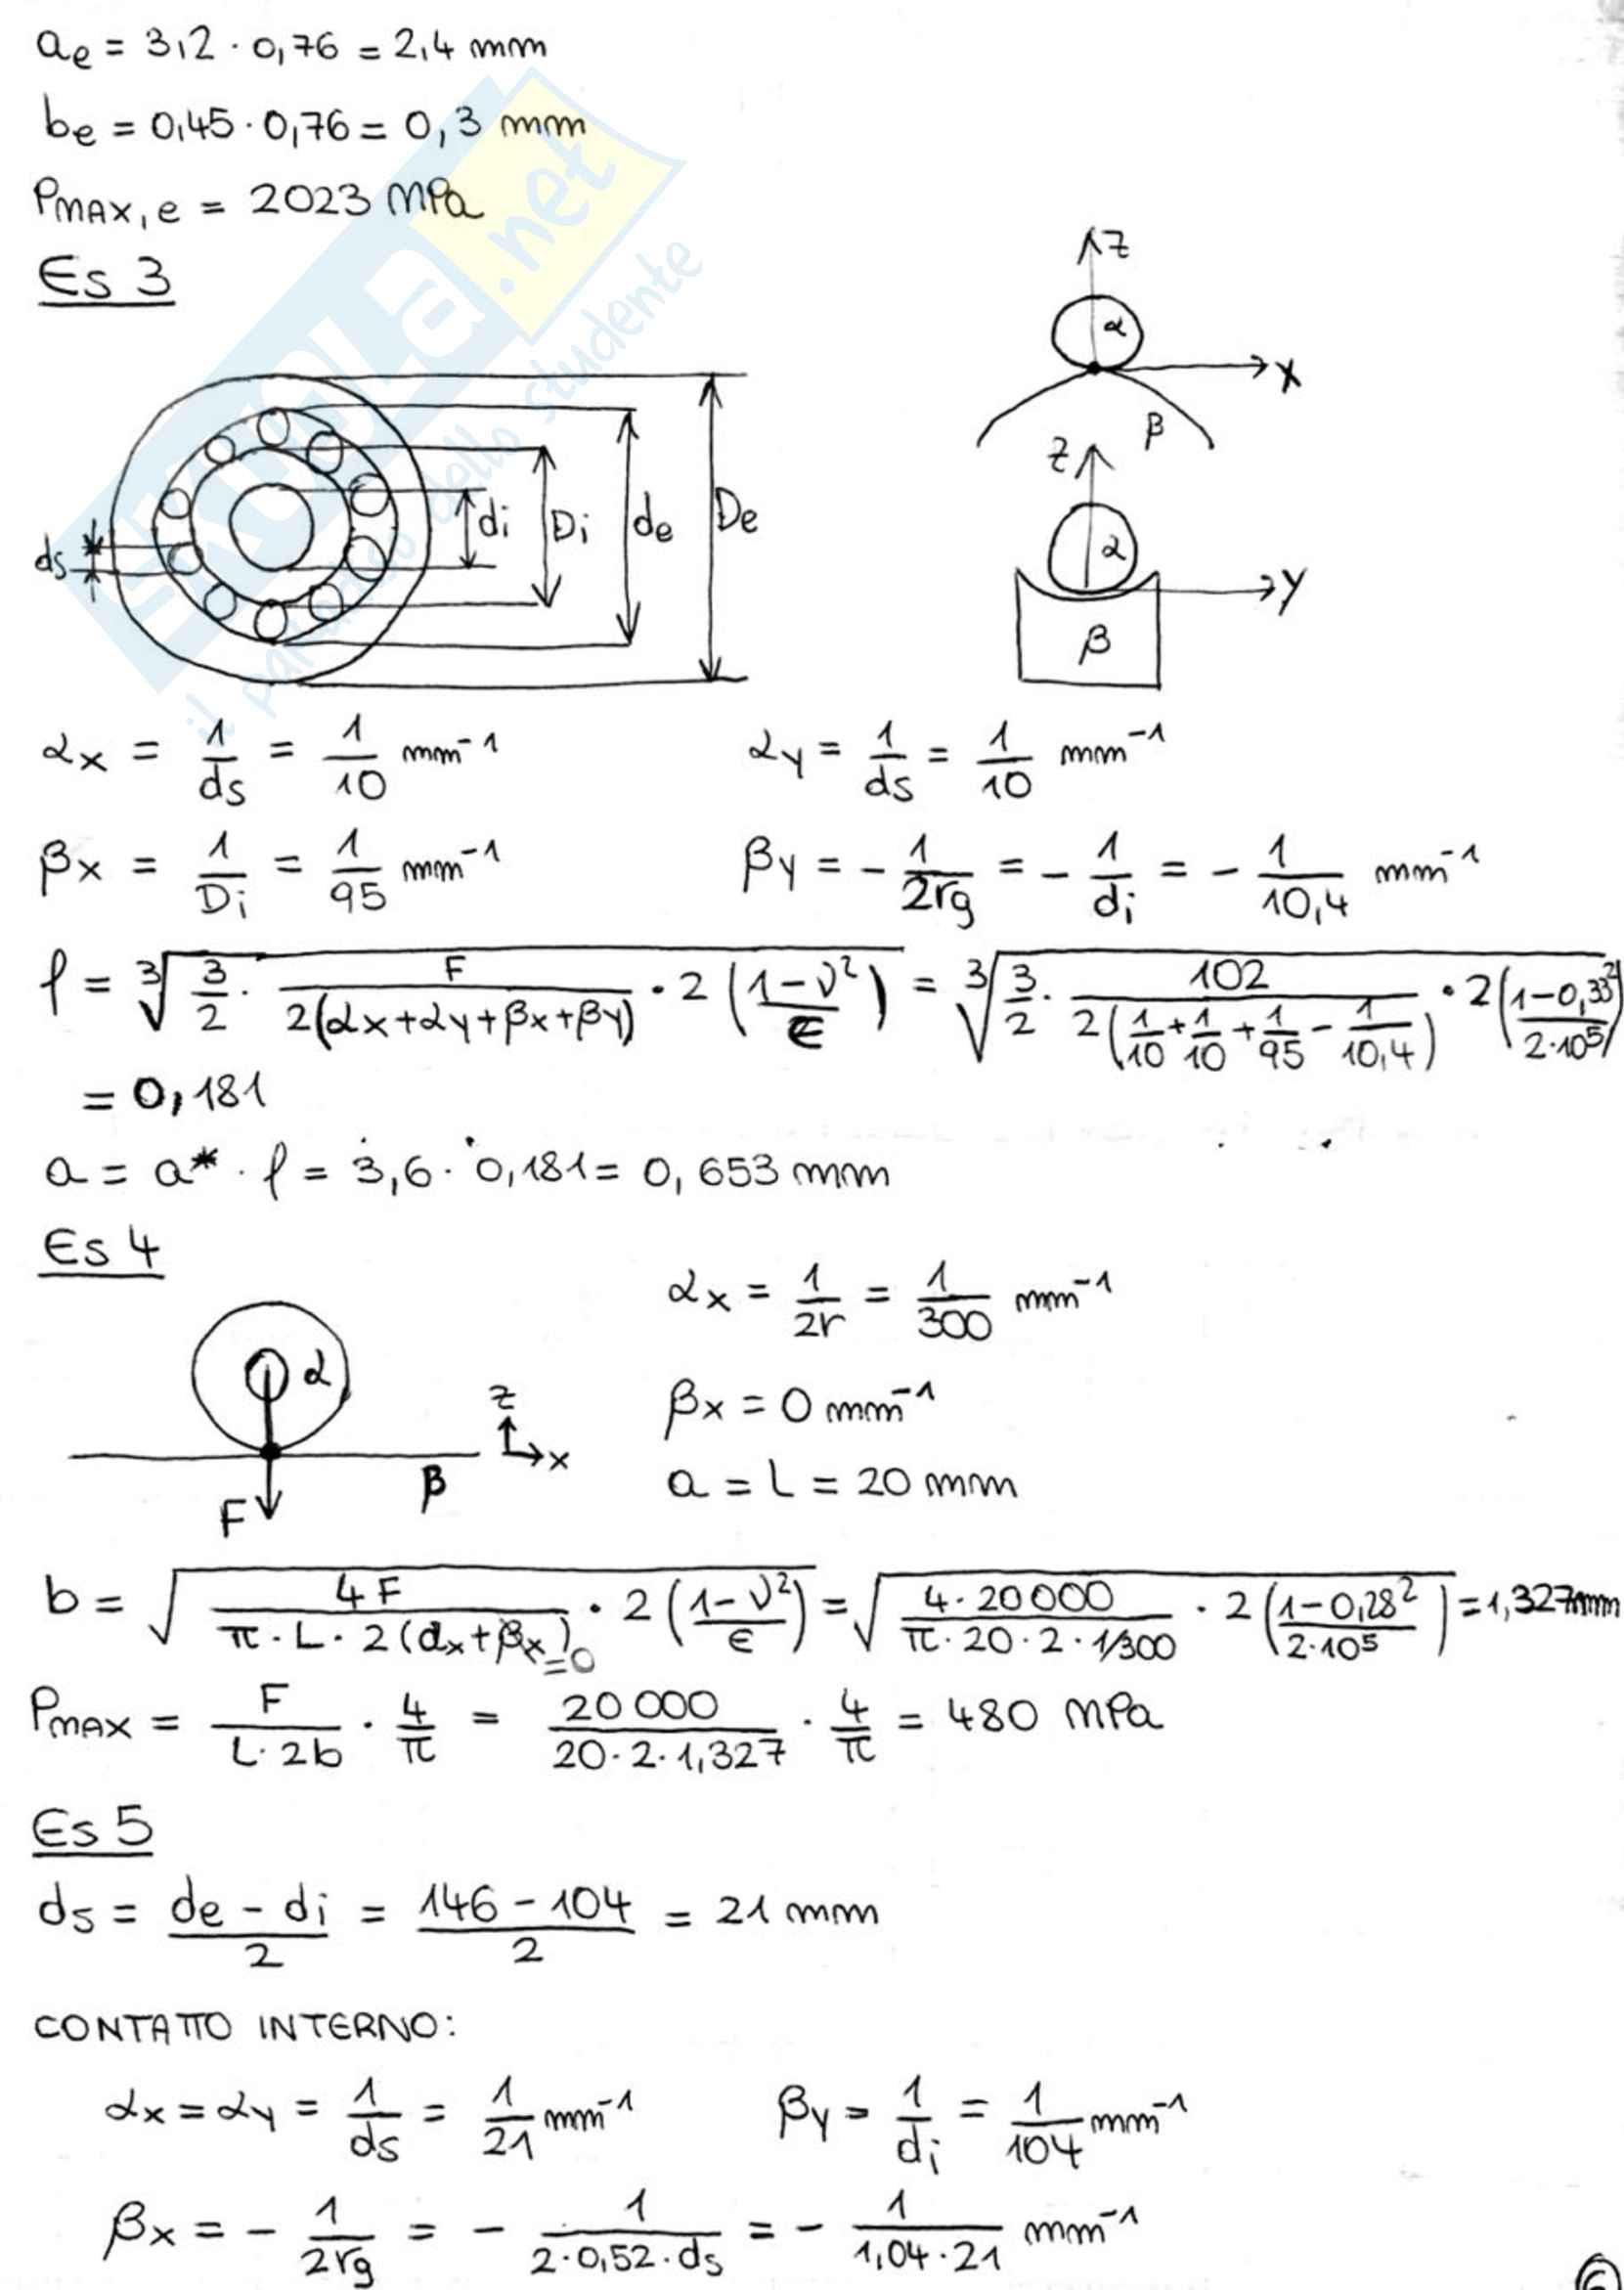 Esercitazioni di elementi di costruzione e disegno di macchine Pag. 11